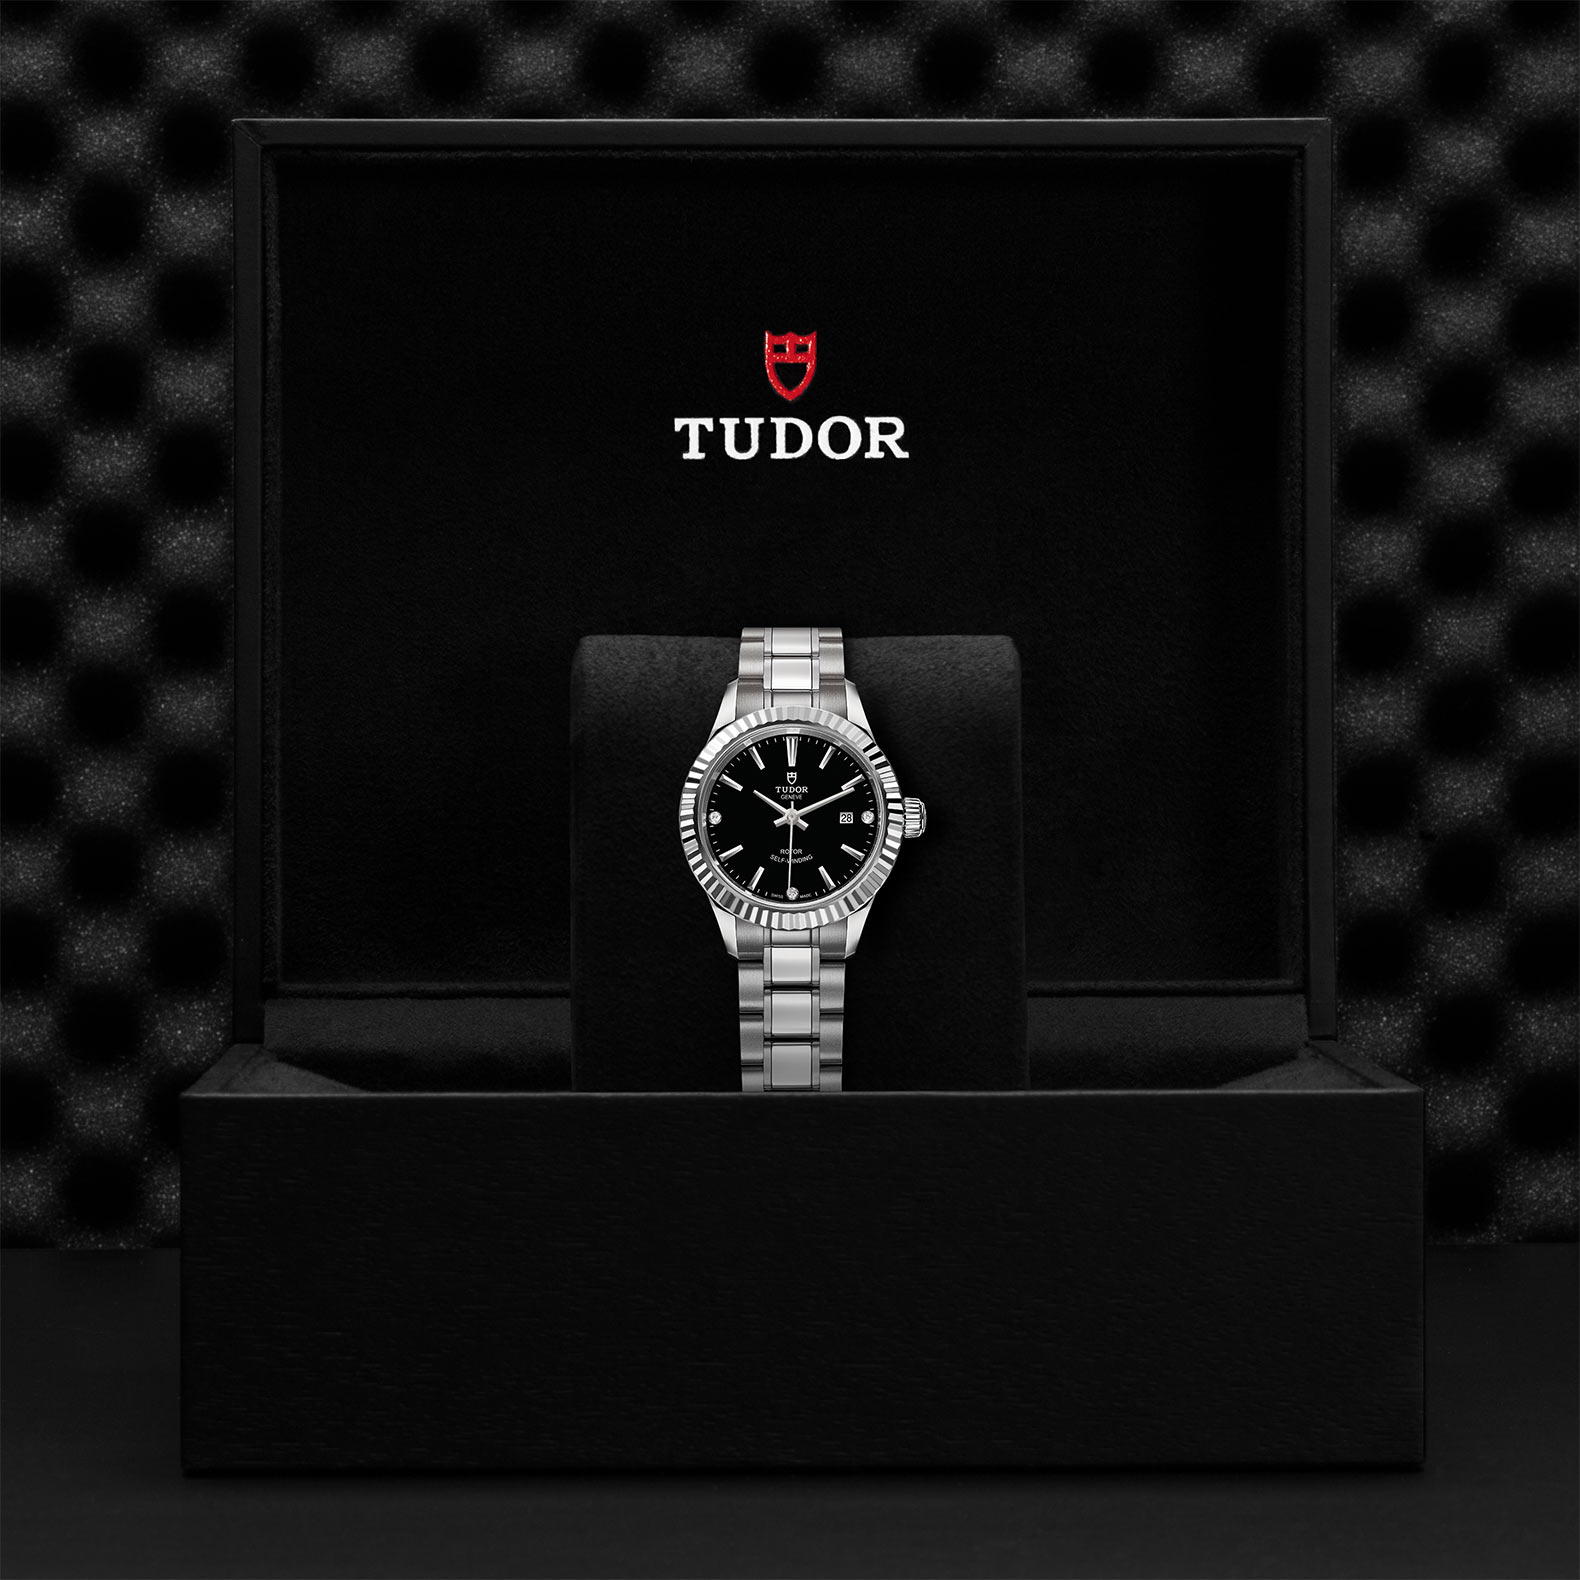 TUDOR Style M12110 0009 Presentation